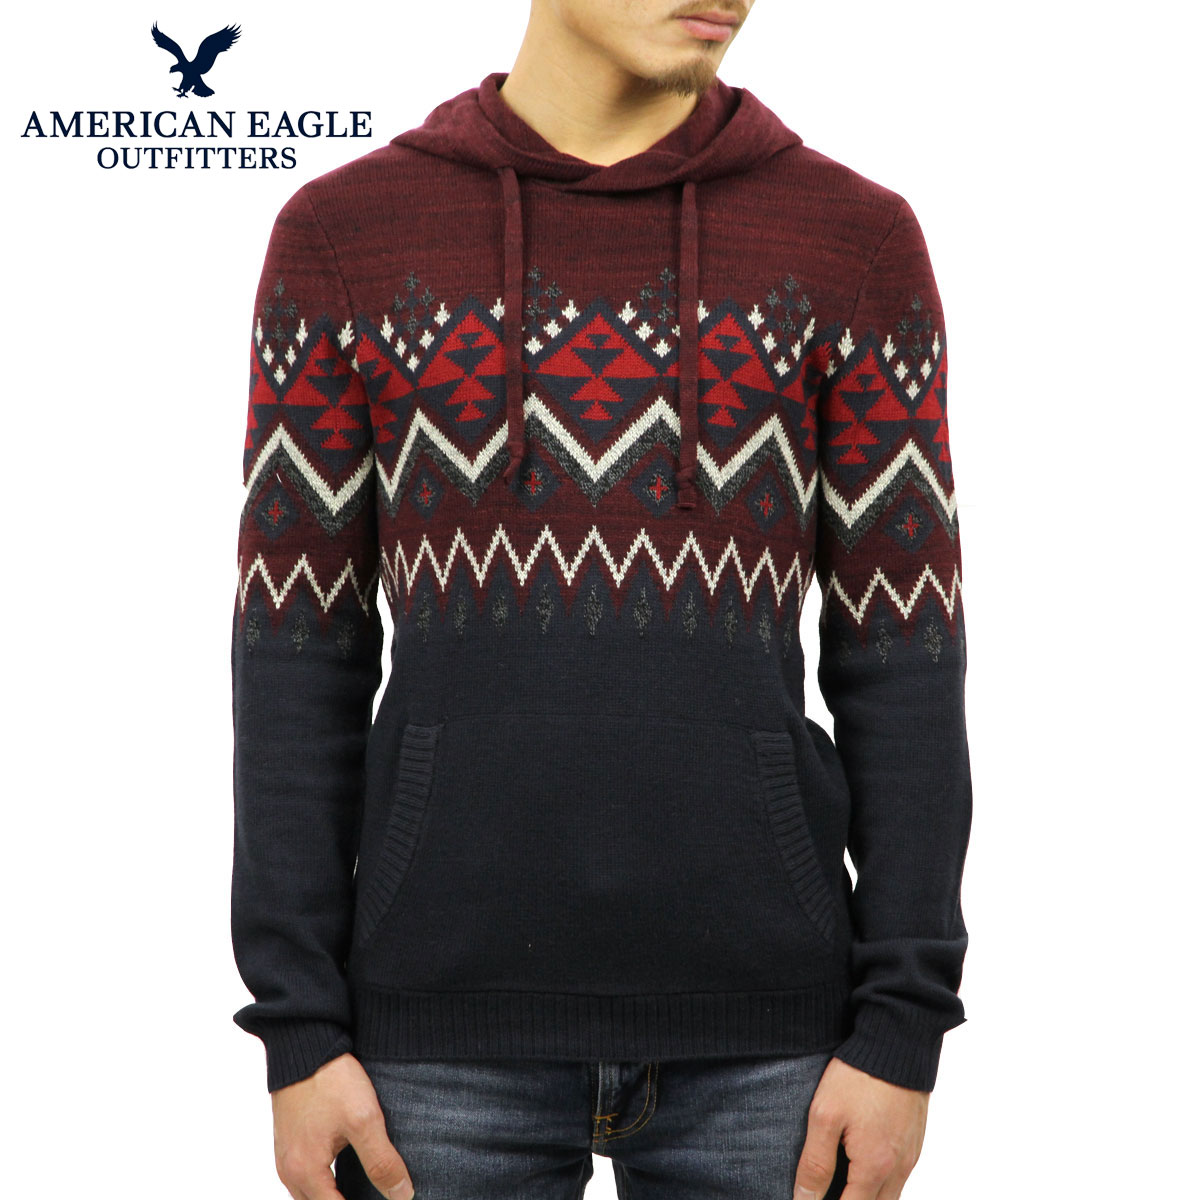 AMERICAN EAGLE メンズ プルオーバーパーカー セーター 正規品 アメリカンイーグル AE OUR BEST BAJA SWEATER 1149-1362-006